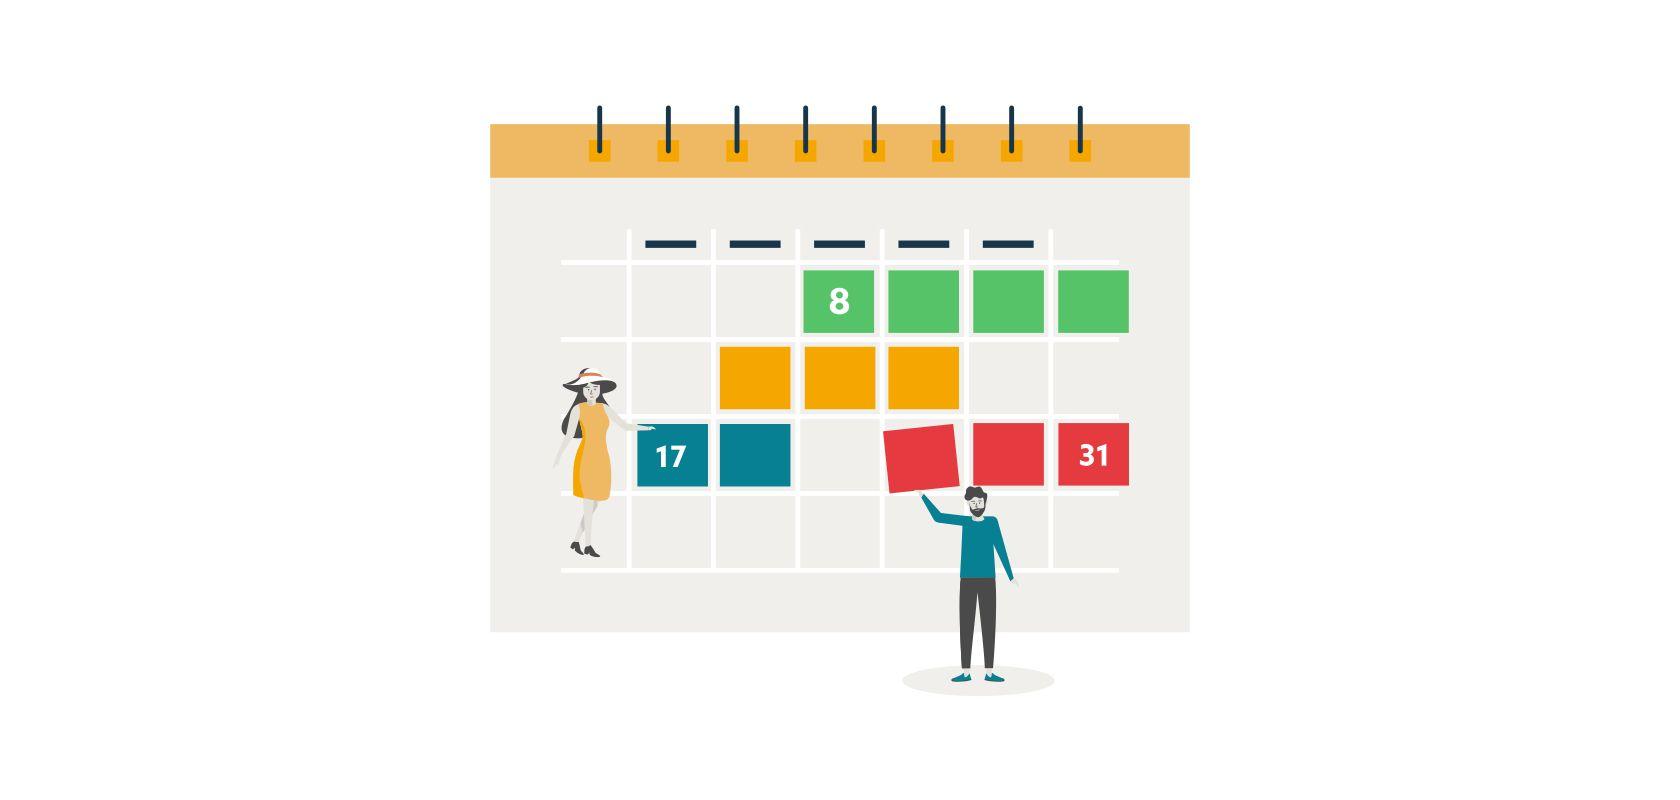 Alt Fechas_Calendario_HomeExchange, title Fechas_Calendario_HomeExchange